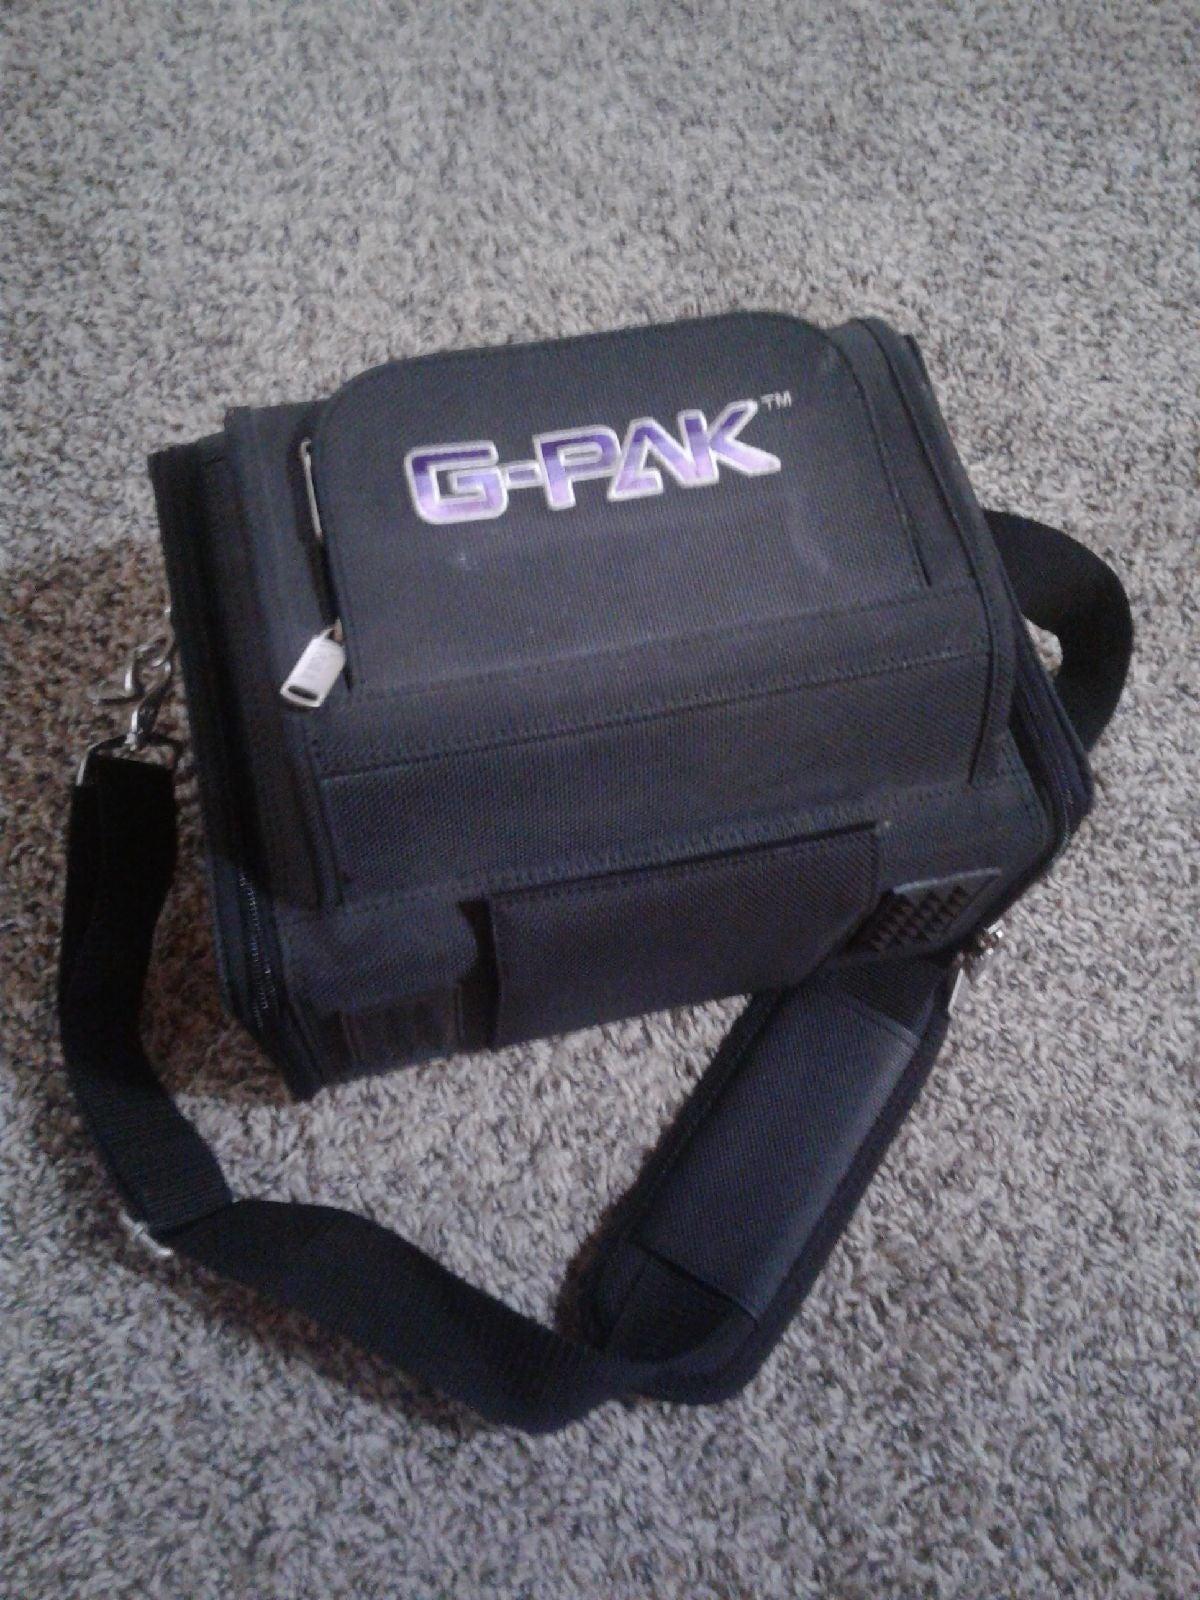 Gamecube Carrying Case w/ shoulder strap